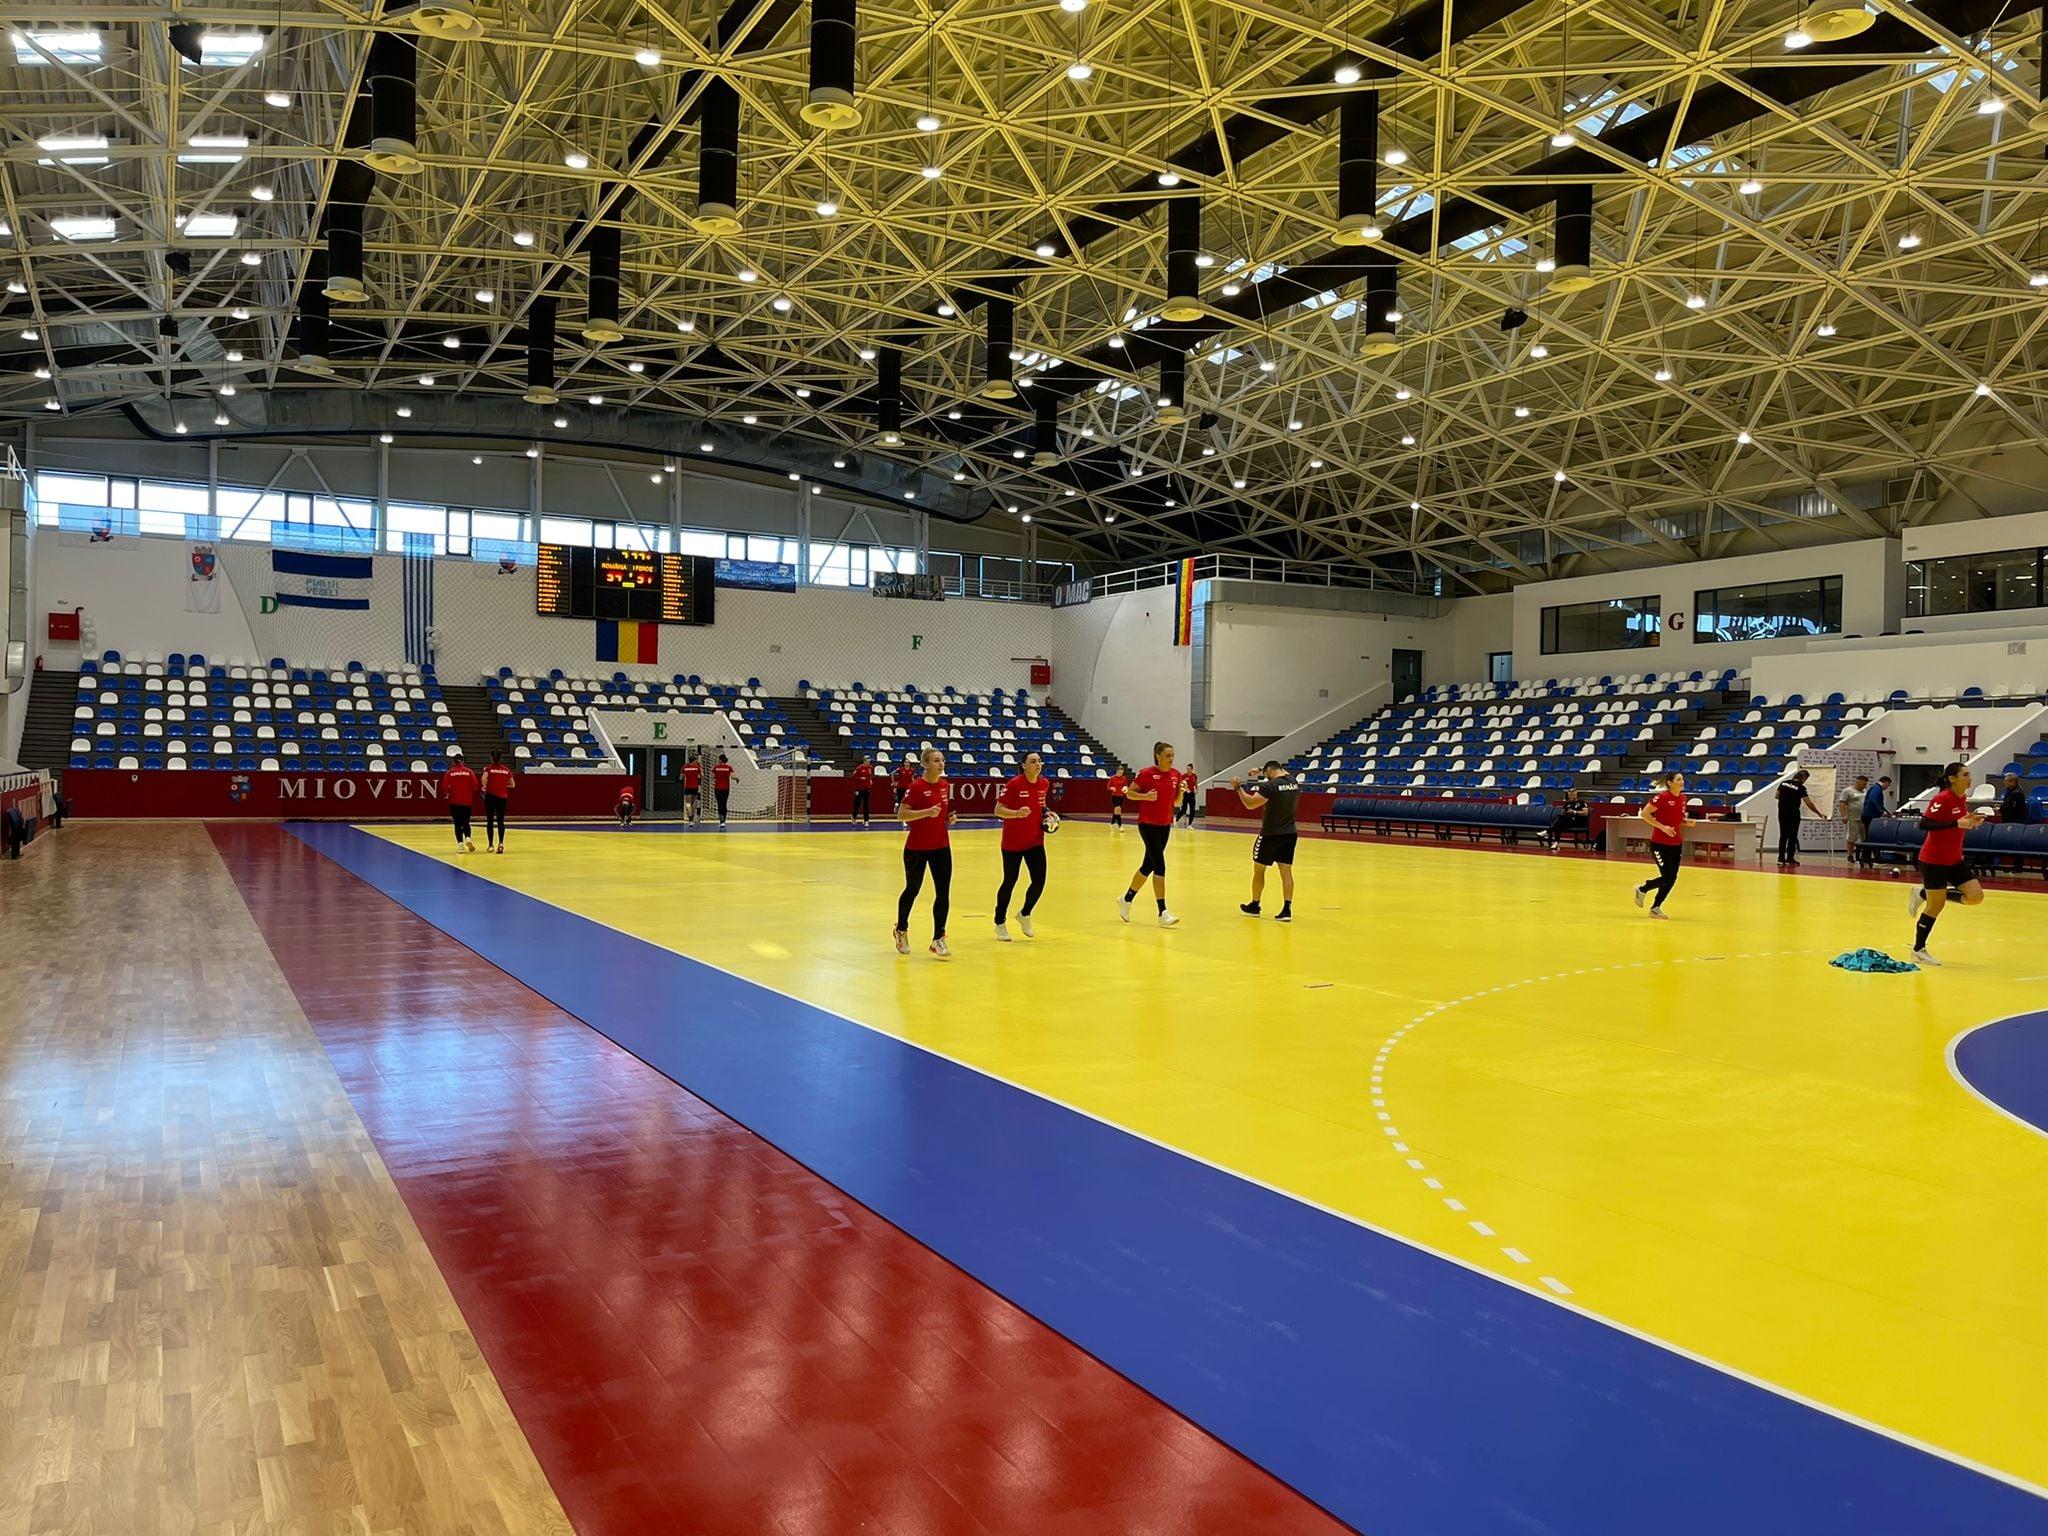 Antrenament Nationala de handbal feminin_in sala de la Mioveni